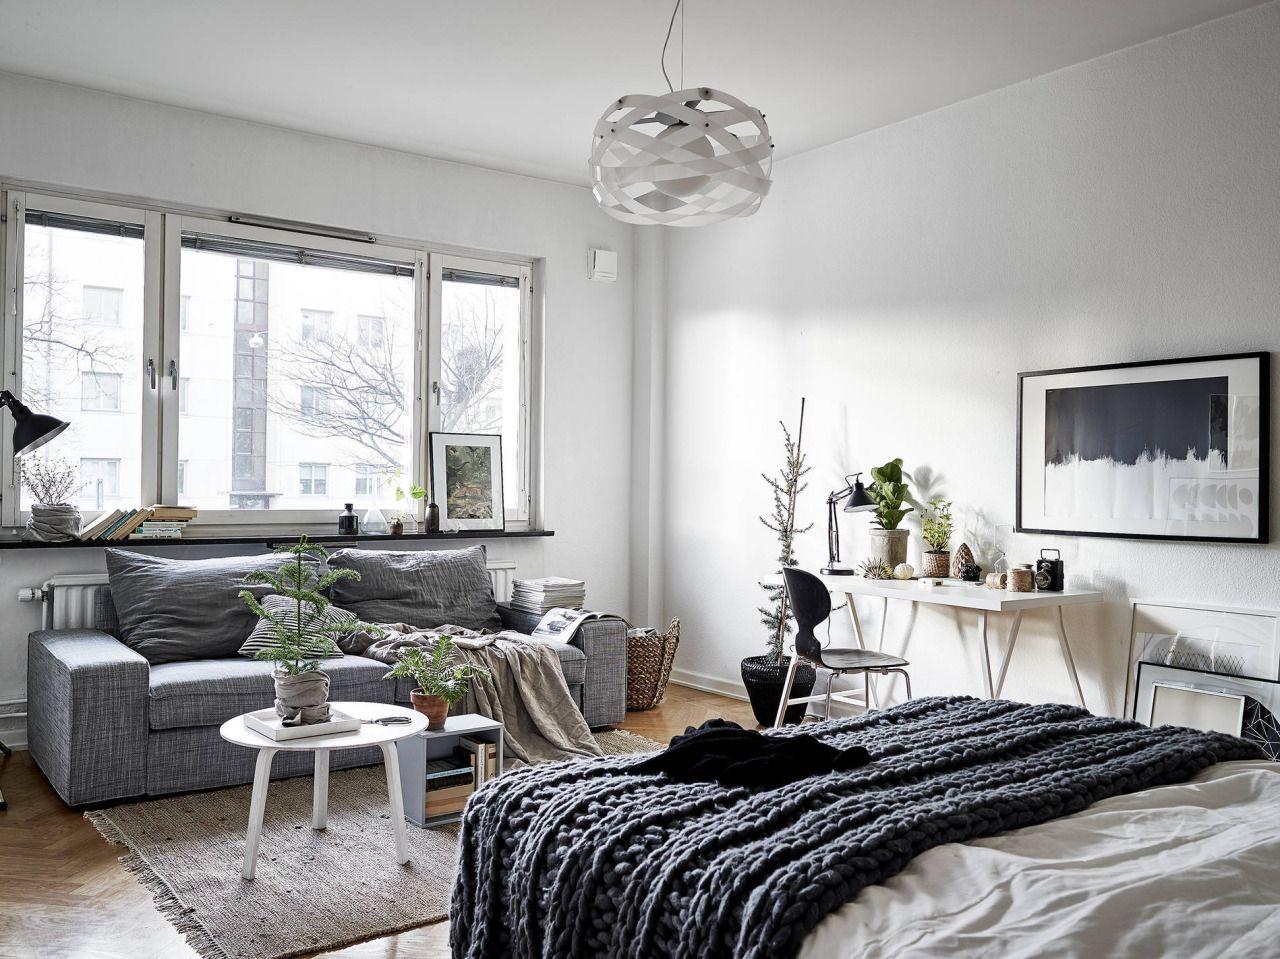 lucayan breeze photo hnliche tolle projekte und ideen. Black Bedroom Furniture Sets. Home Design Ideas